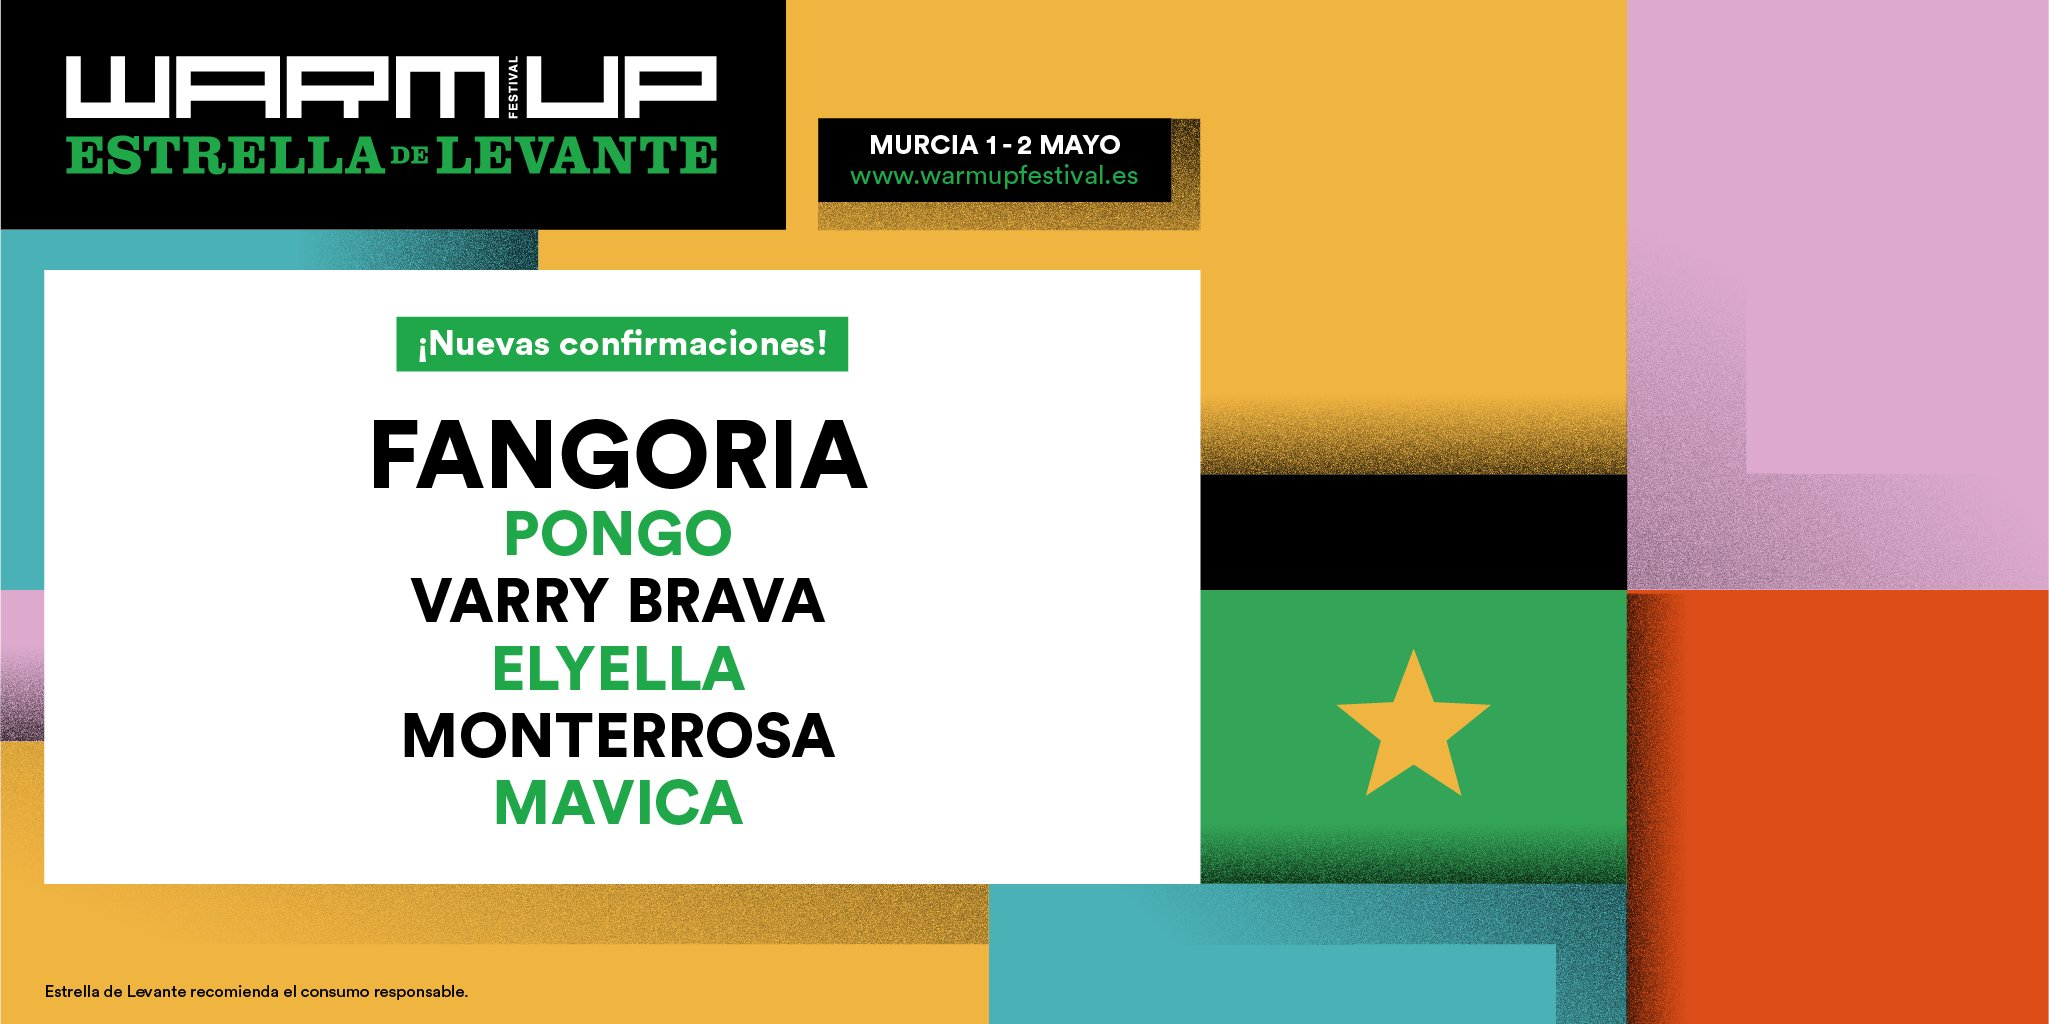 Festival WARM UP de Murcia (Kraftwerk, Hot Chip, Modeselektor, Johnny Marr...) EMta44WWsAIitBq?format=jpg&name=4096x4096